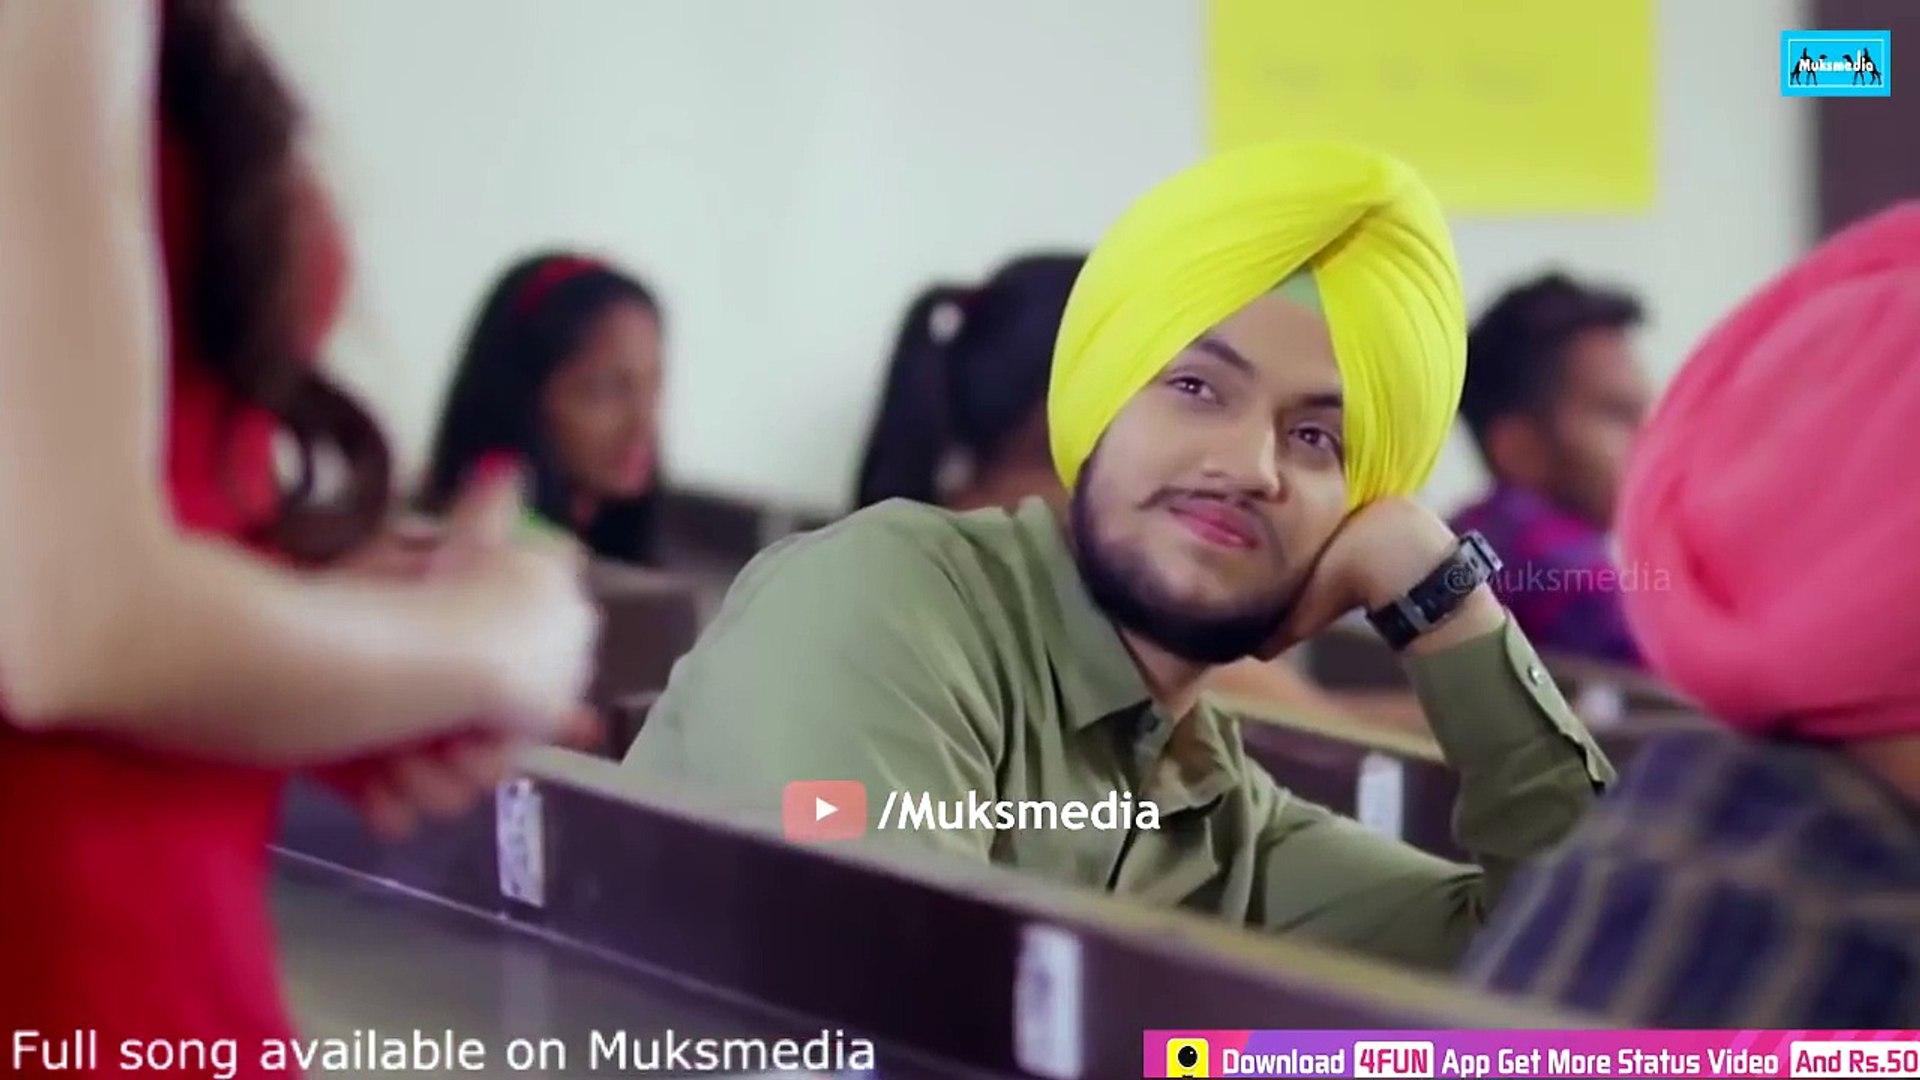 Boys Attitude Whatsapp Status Video 2018, whatsapp sad status, whatsapp sad  video, whatsapp sad song, whatsapp sad status in hindi, whatsapp sad love  story, whatsapp sad dp, whatsapp sad chat,